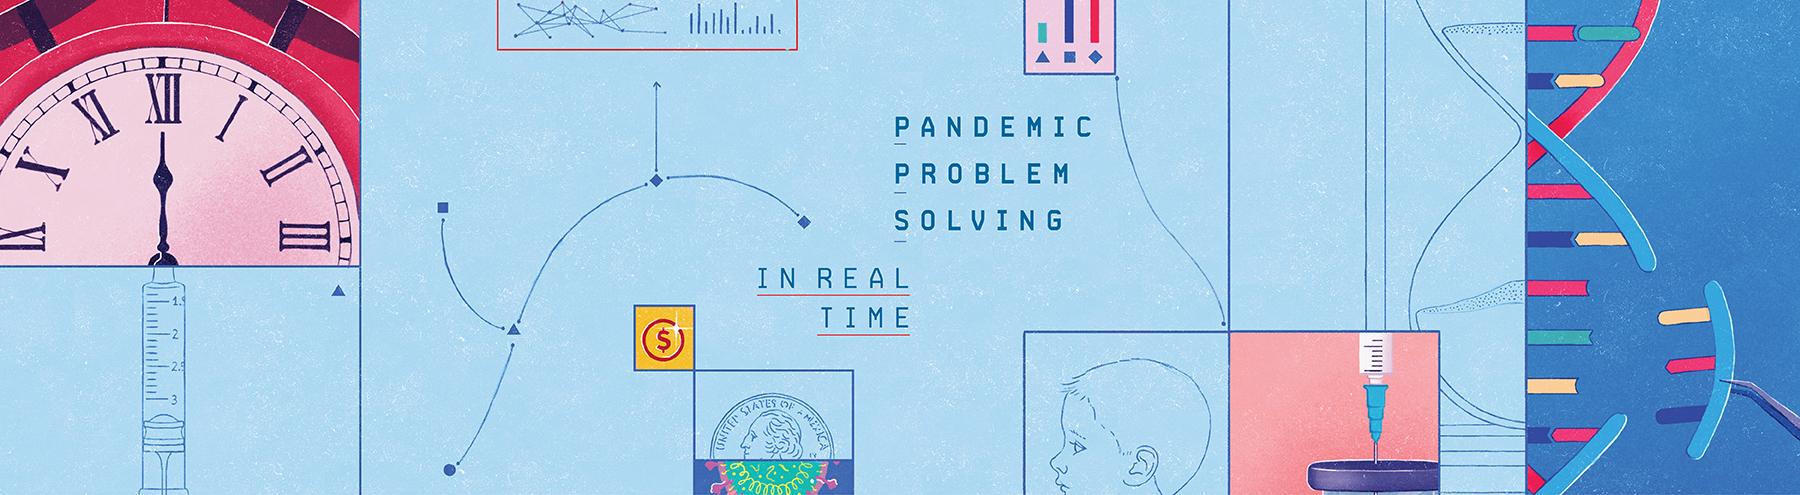 Pandemic Problem Solving